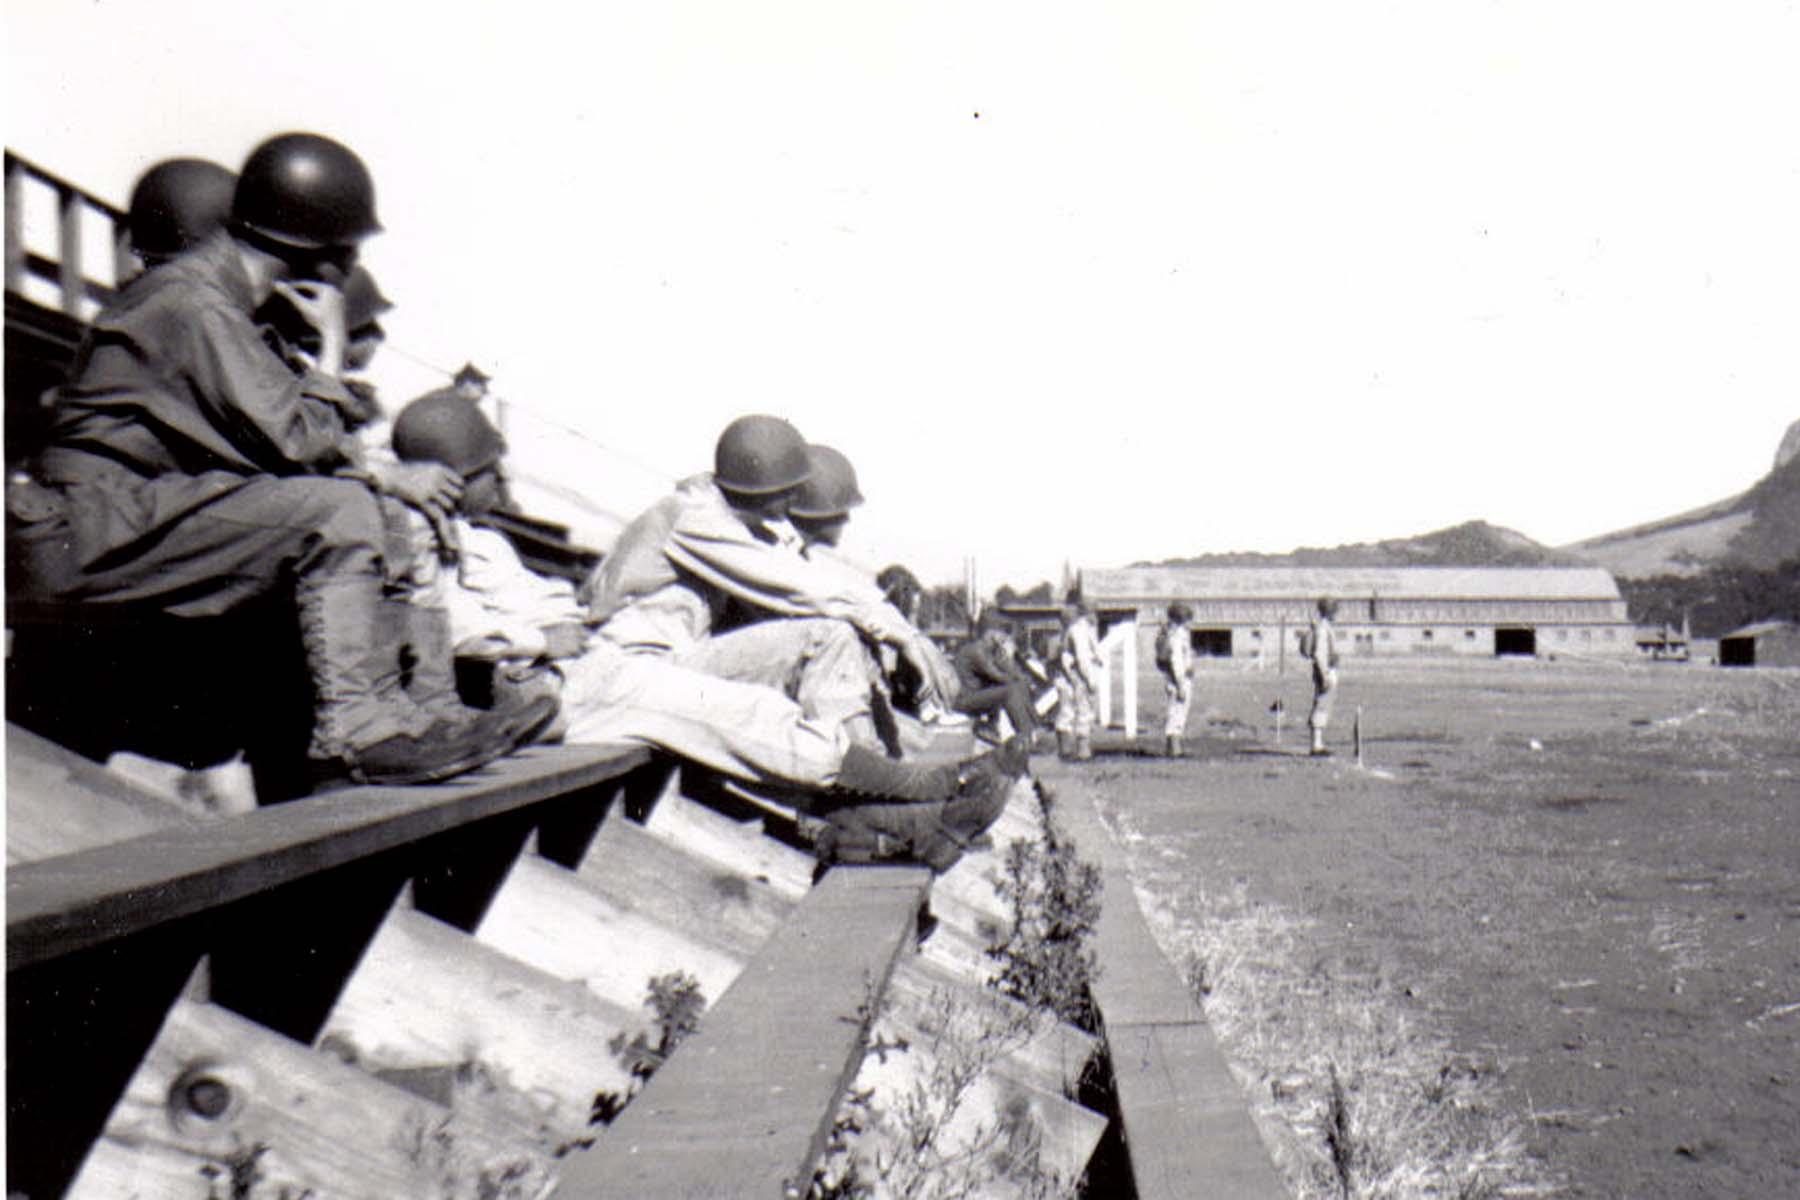 C24 Camp San Luis Obispo - August 2_ 1943 parade - Colonel Privett and staff arrive